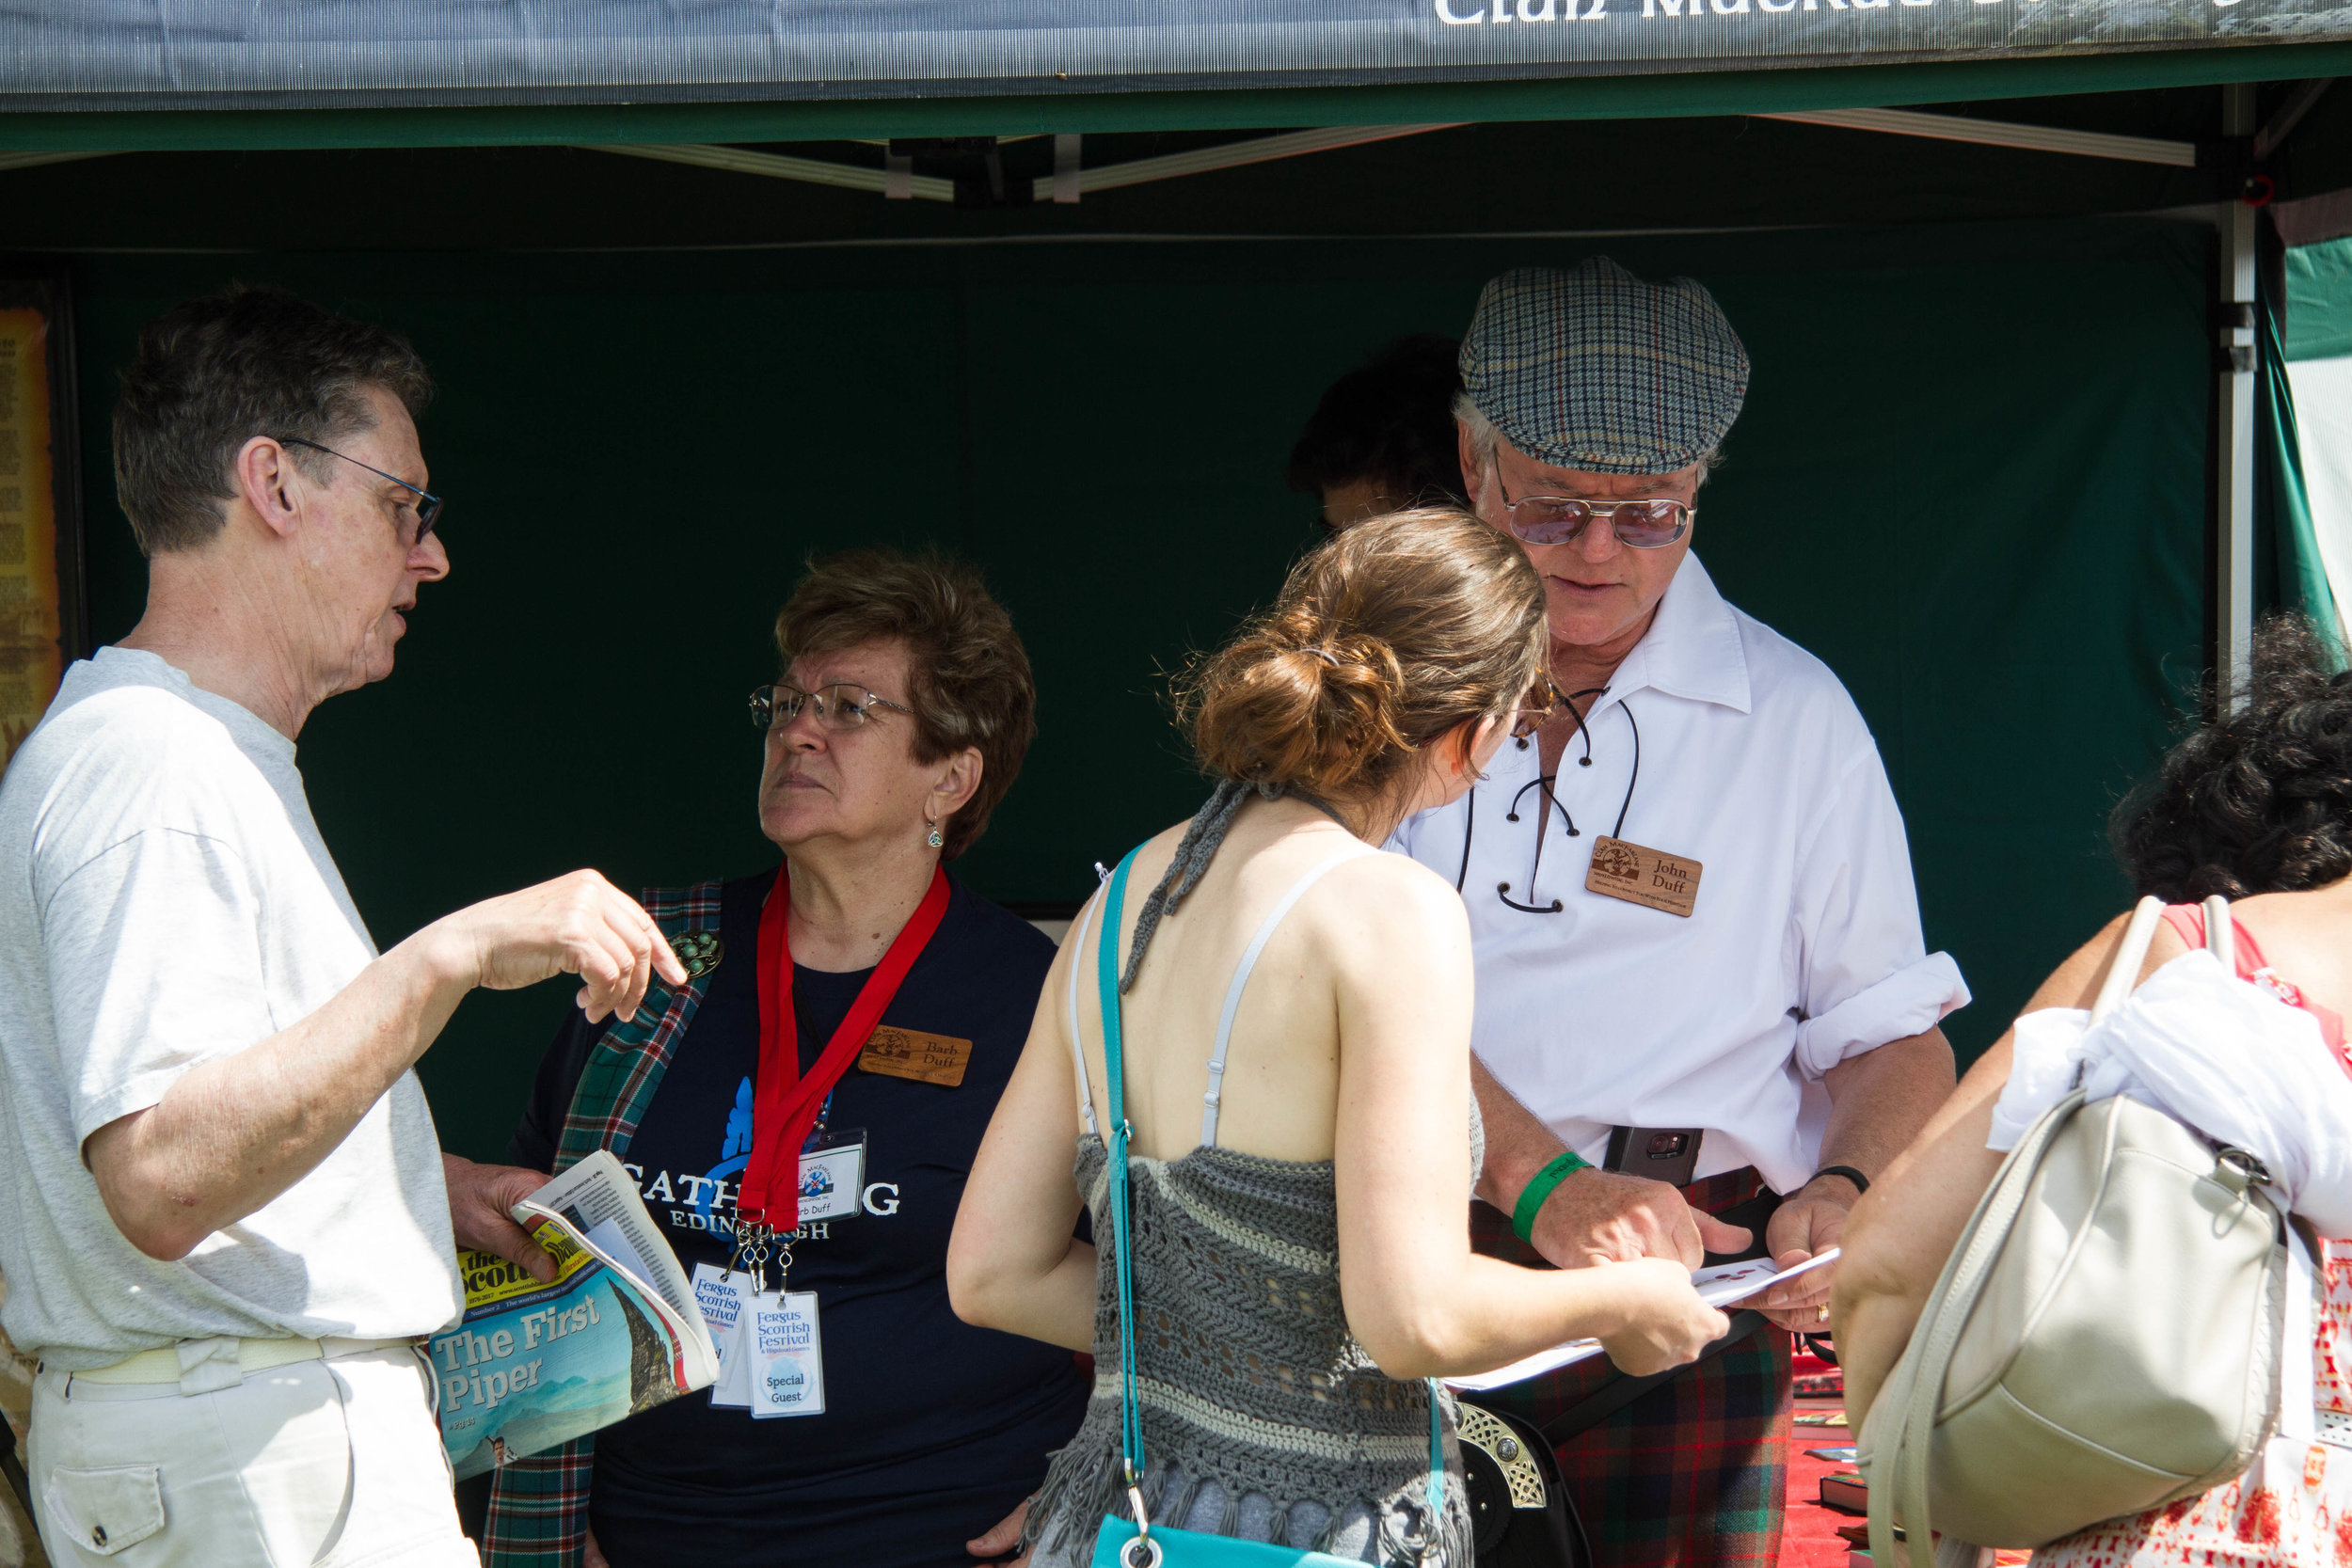 Caledonia organizers, John & Barb Duff, man the MacCrae tent in Fergus in 2018